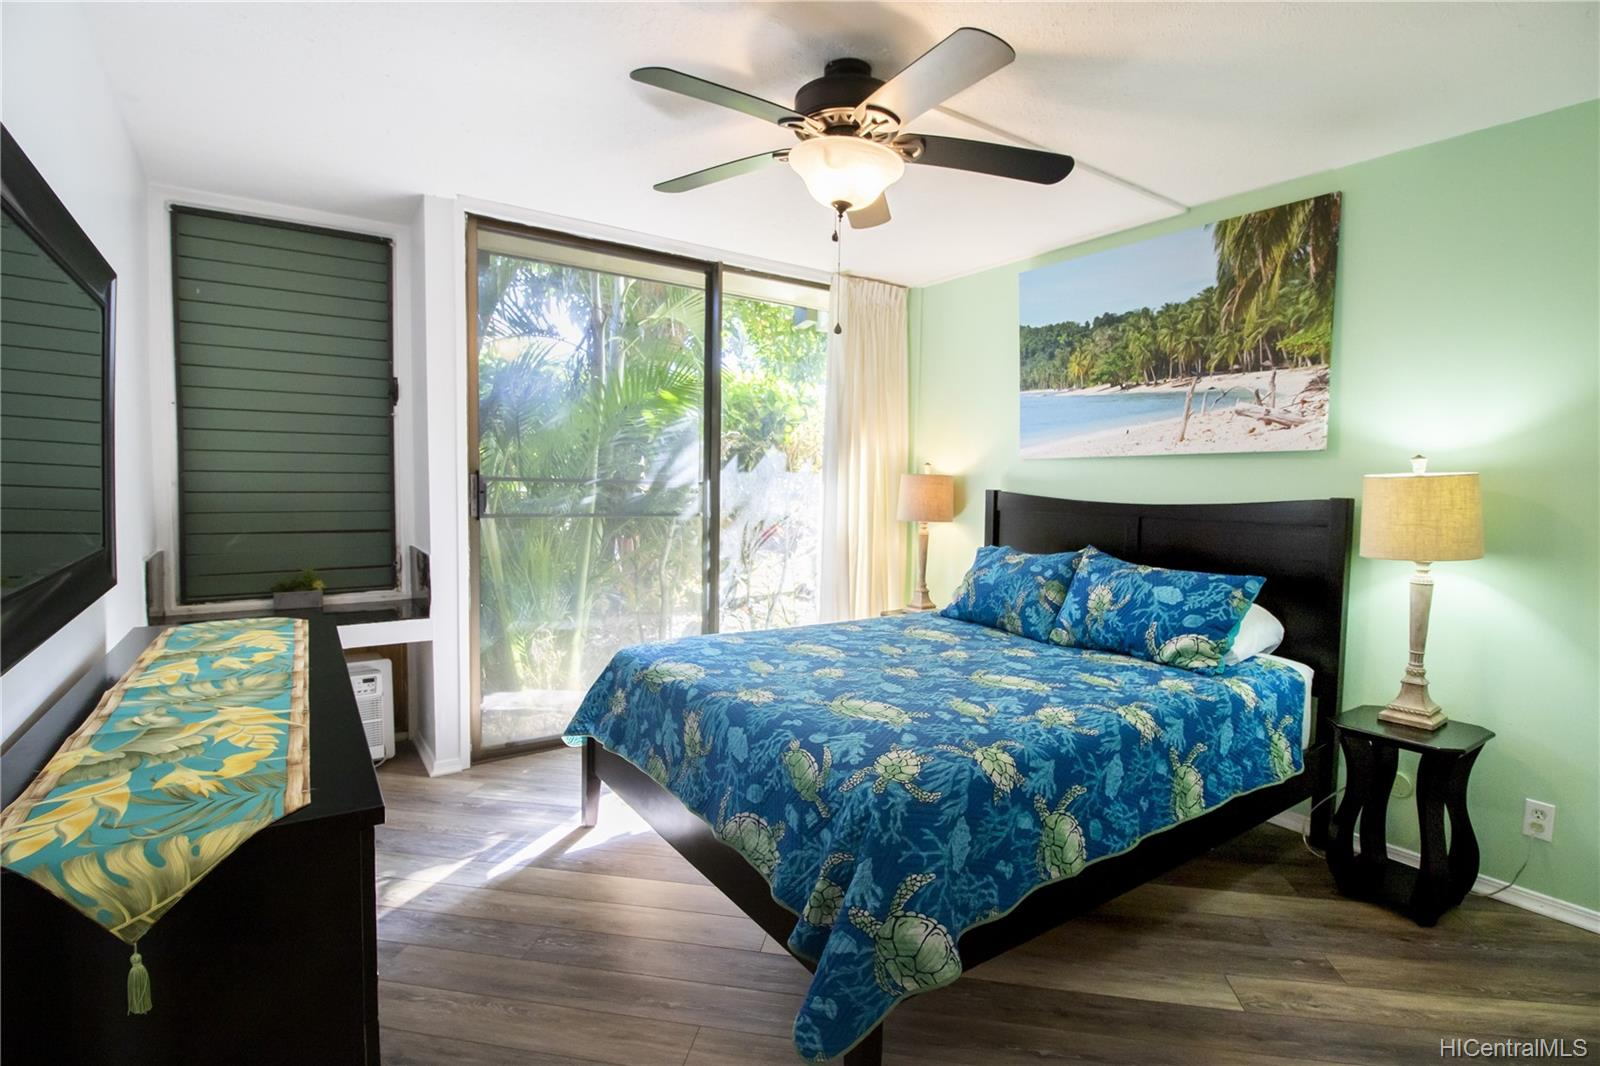 57-101 Kuilima Drive townhouse # 181, Kahuku, Hawaii - photo 12 of 20